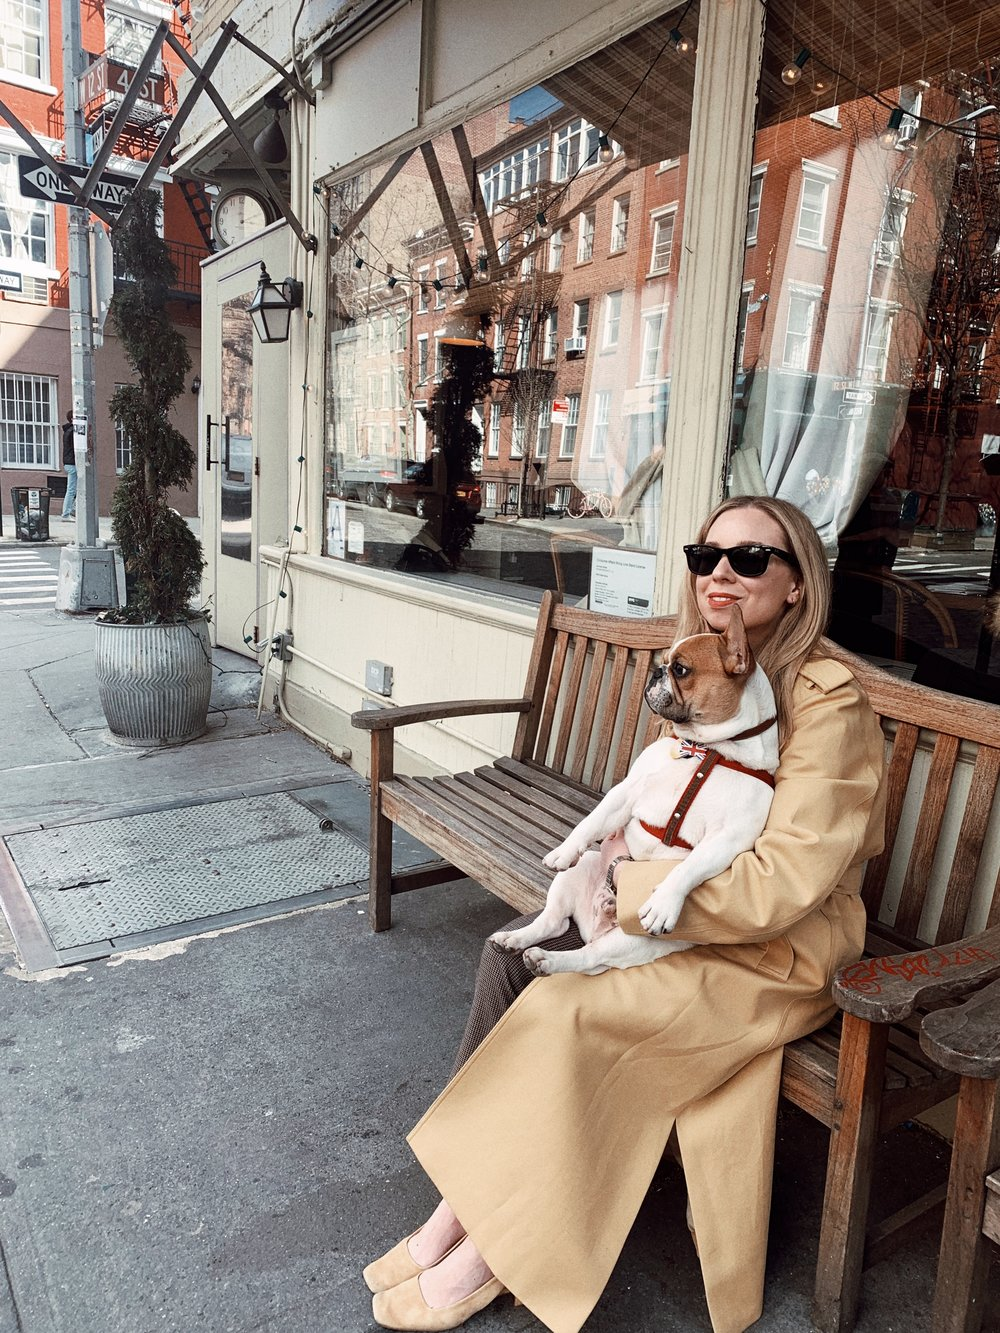 Outside Cafe Cluny.jpg